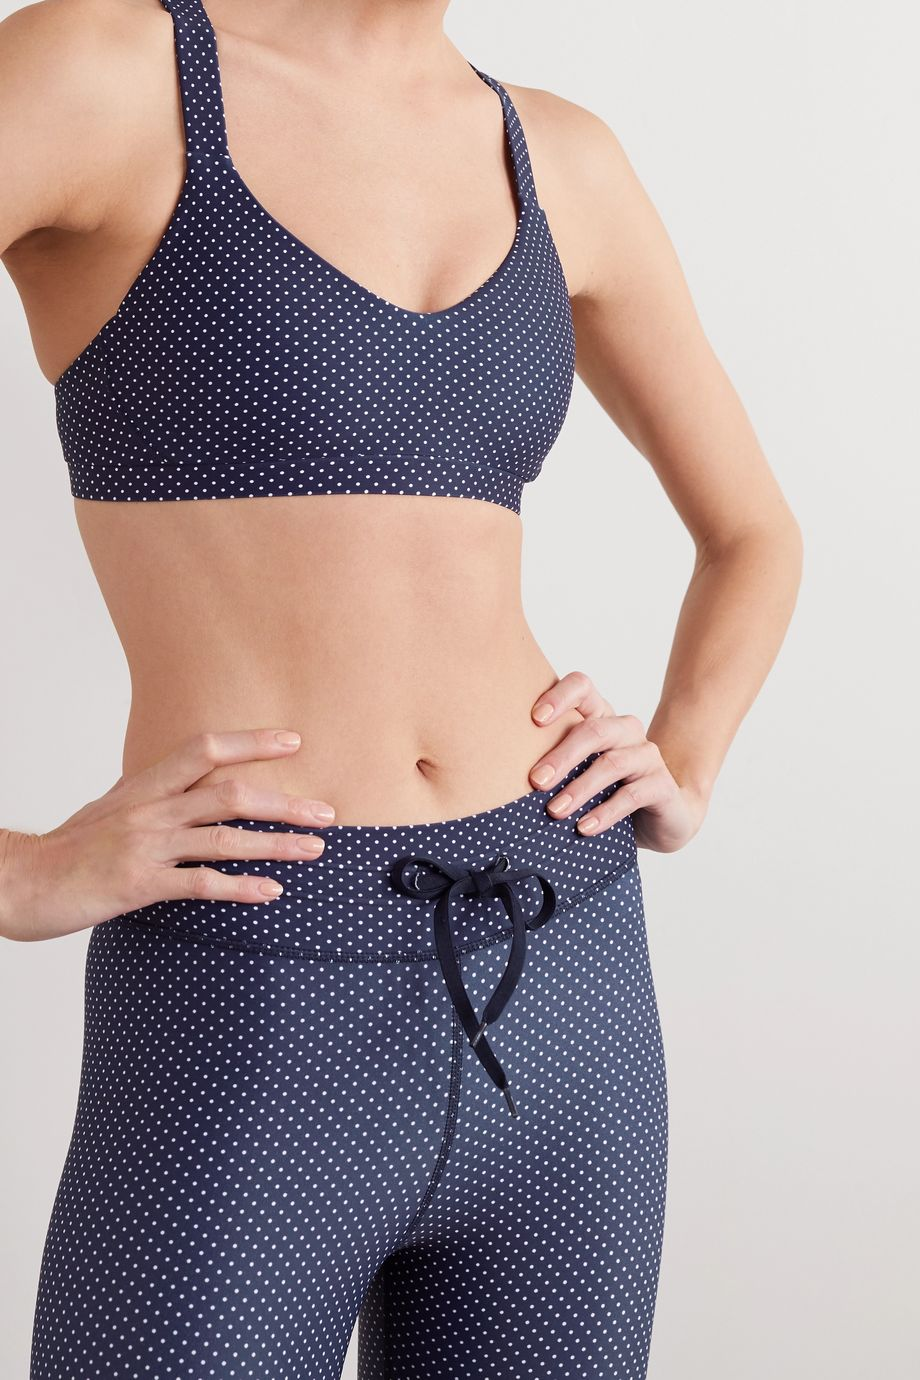 The Upside Sophie polka-dot stretch sports bra